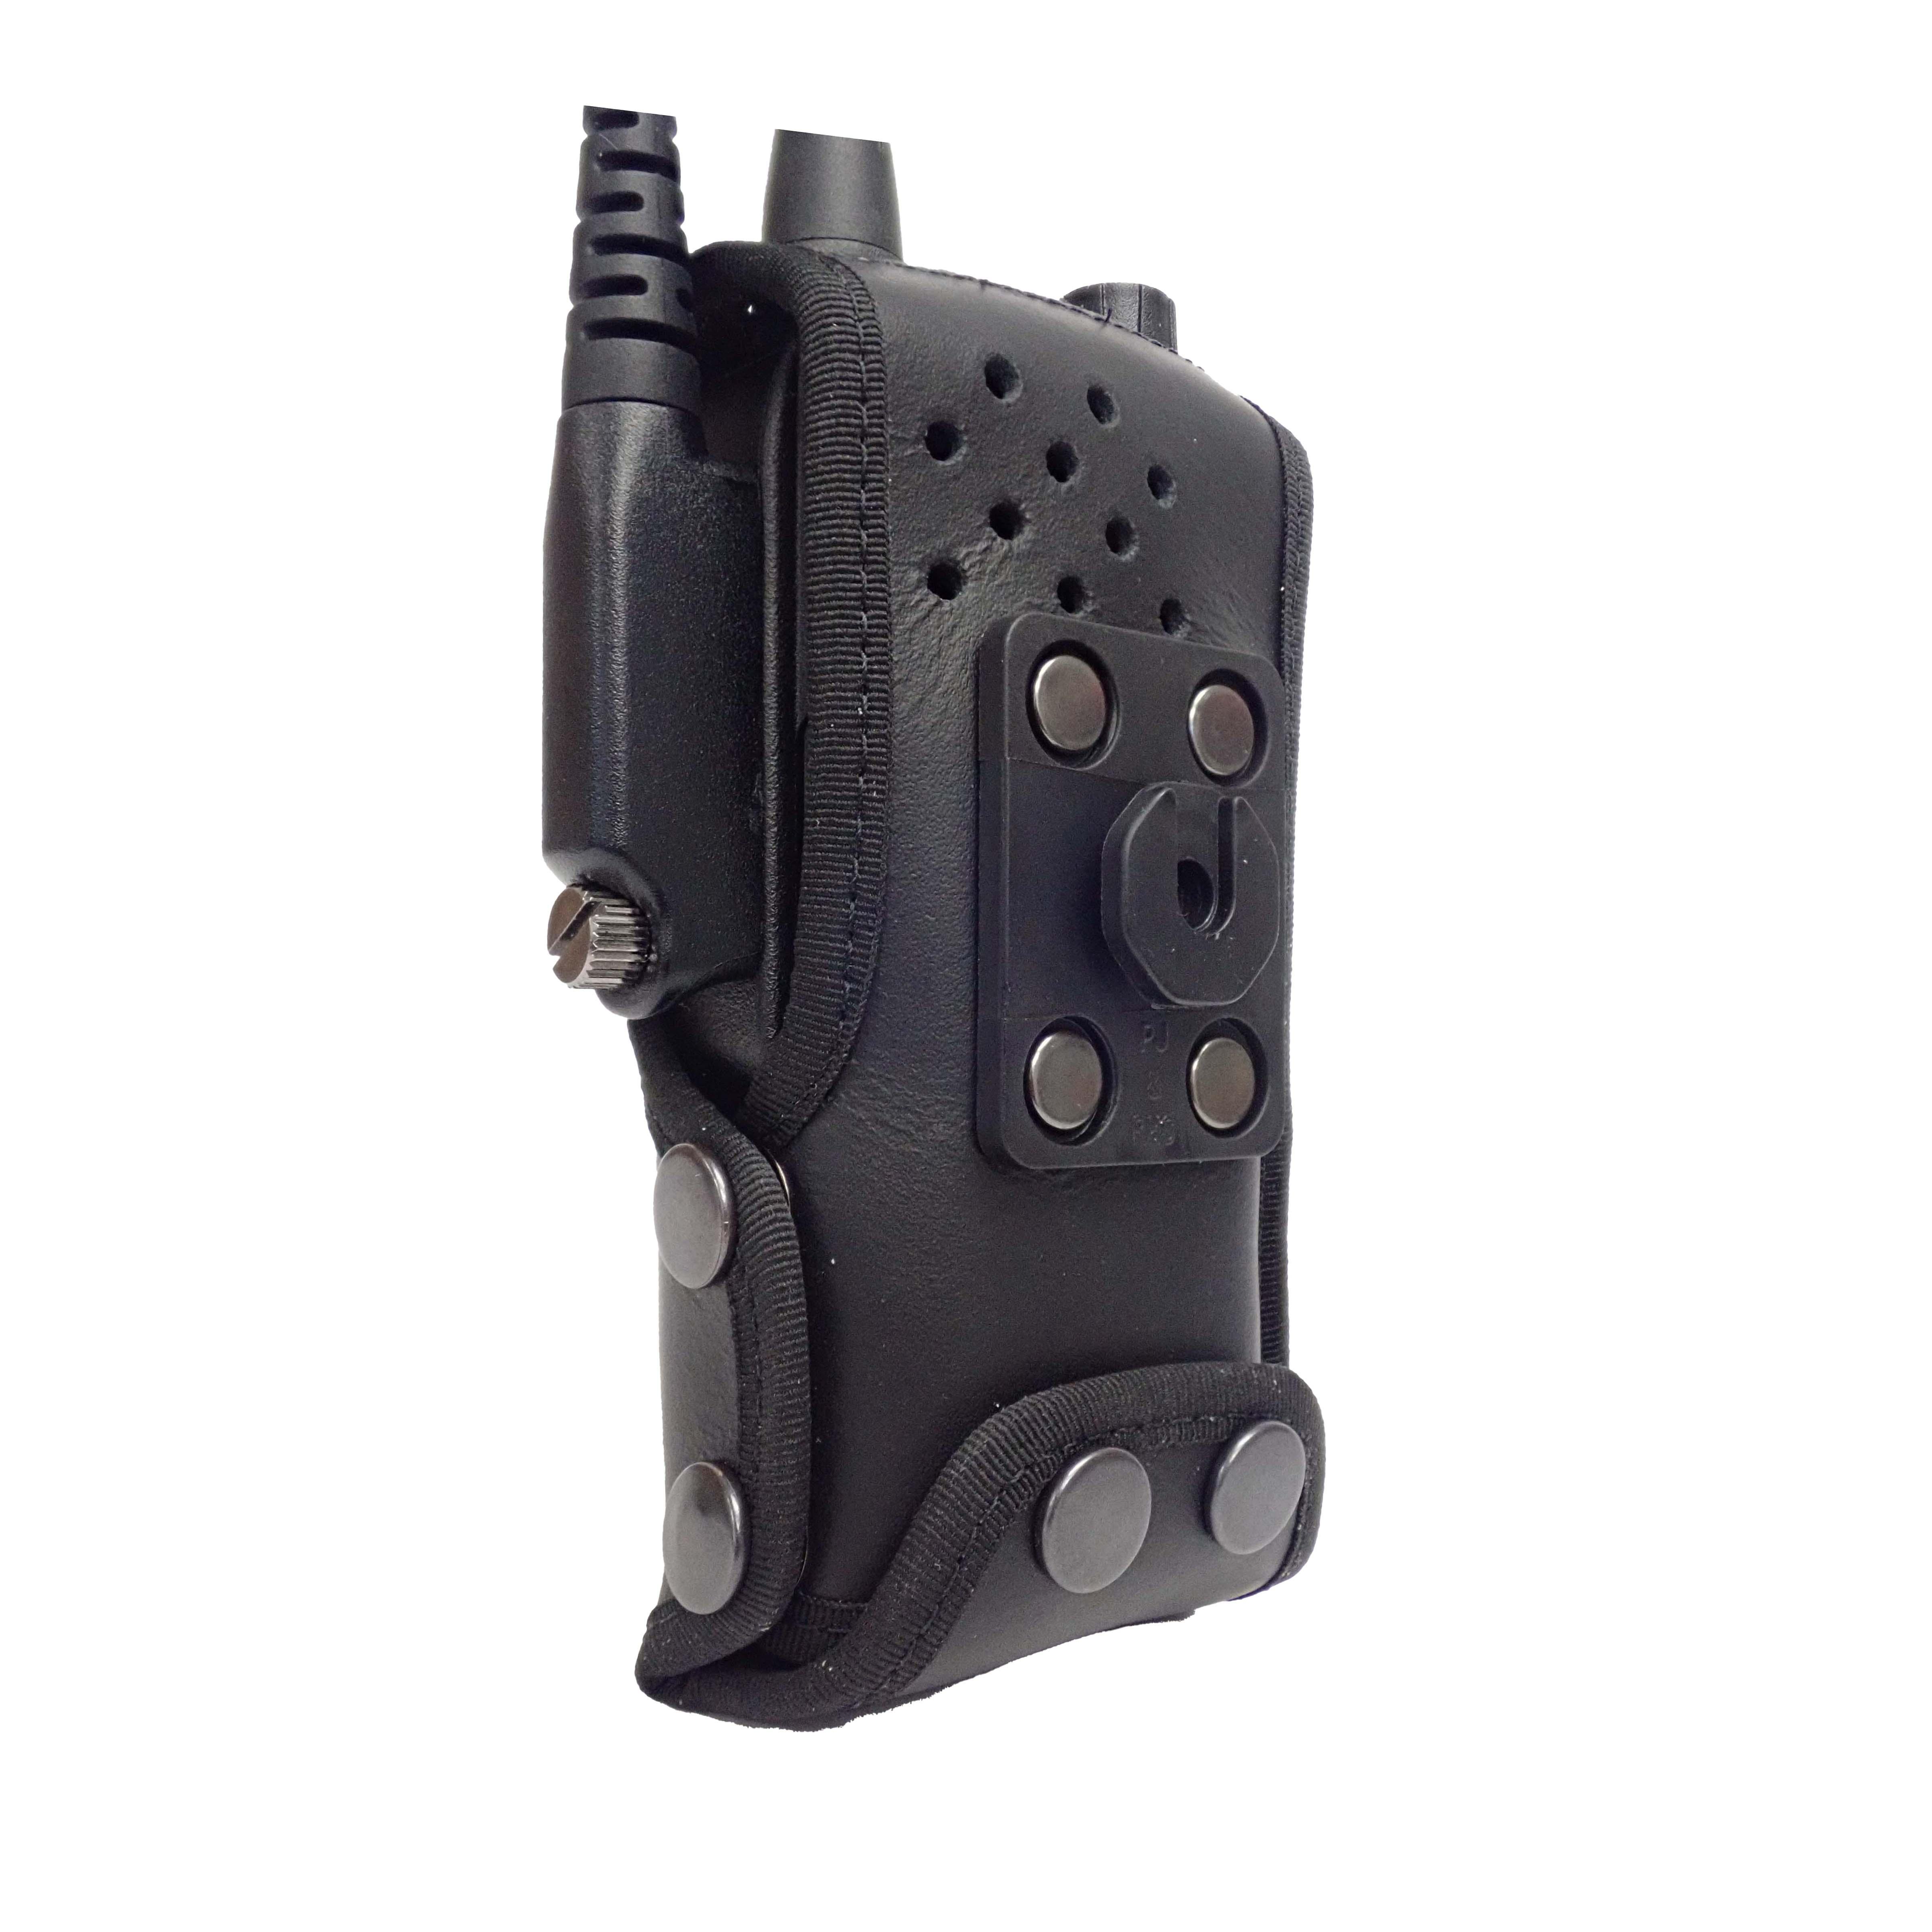 Sepura SC2120 Tetra leather radio case with Click-On